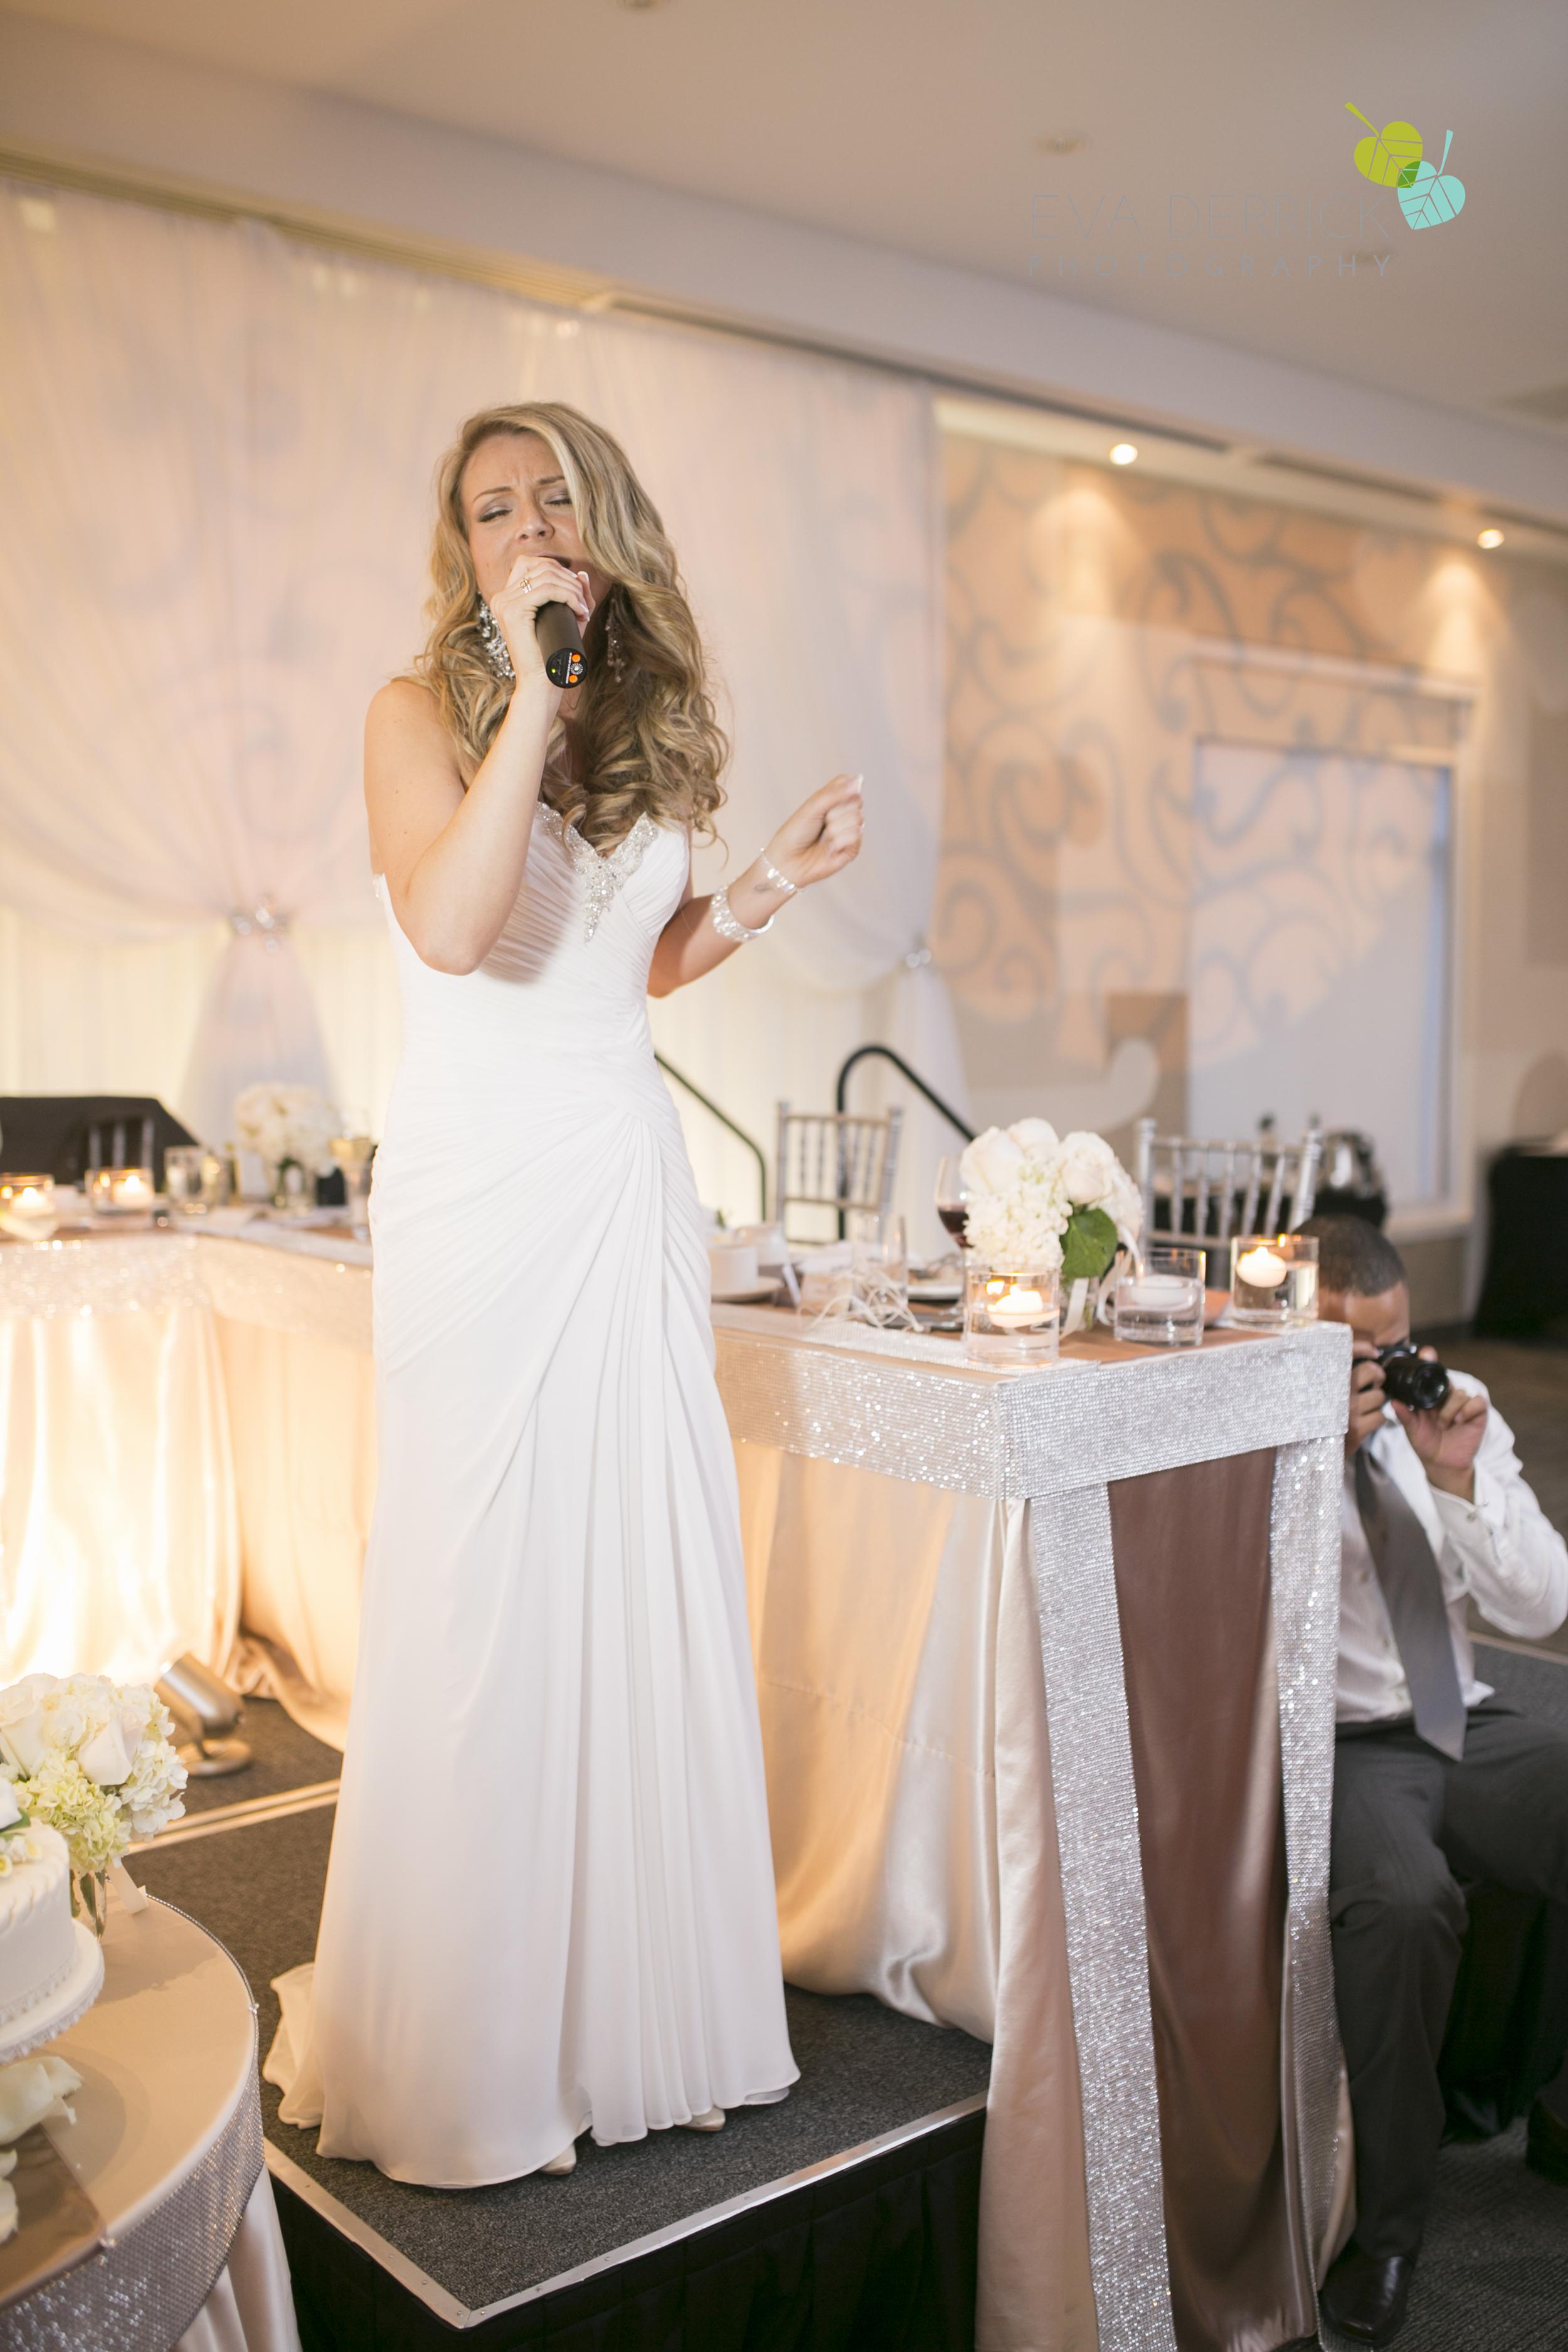 edp_wedding_jenna_chris-0465.jpg